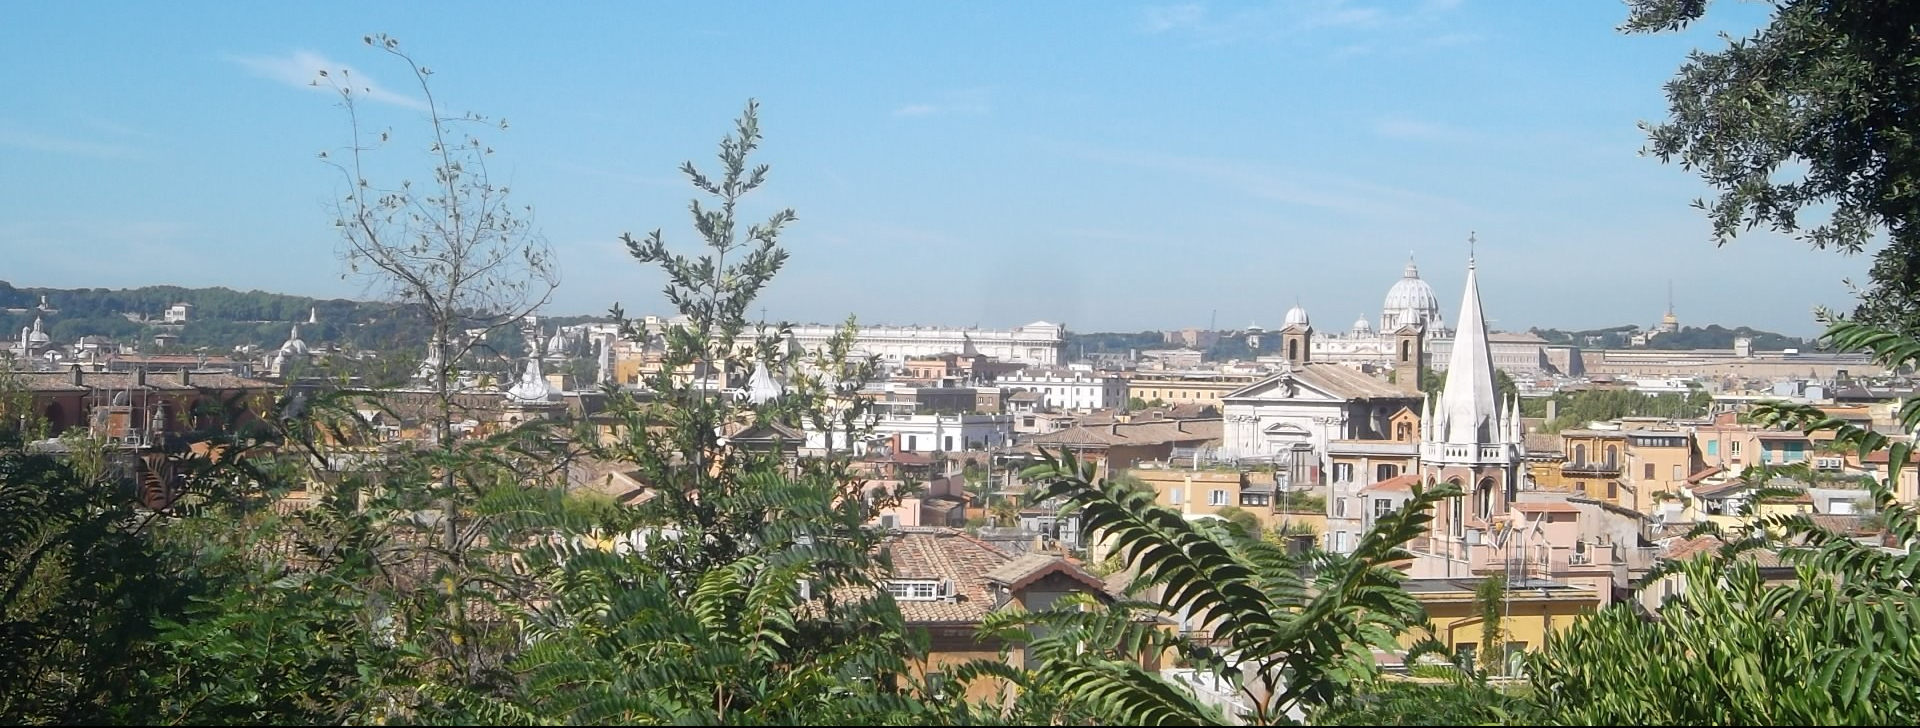 roma-church-trinite-des-monts-street-scenes-fr-viale-trinita-dei-monte-2-aug13